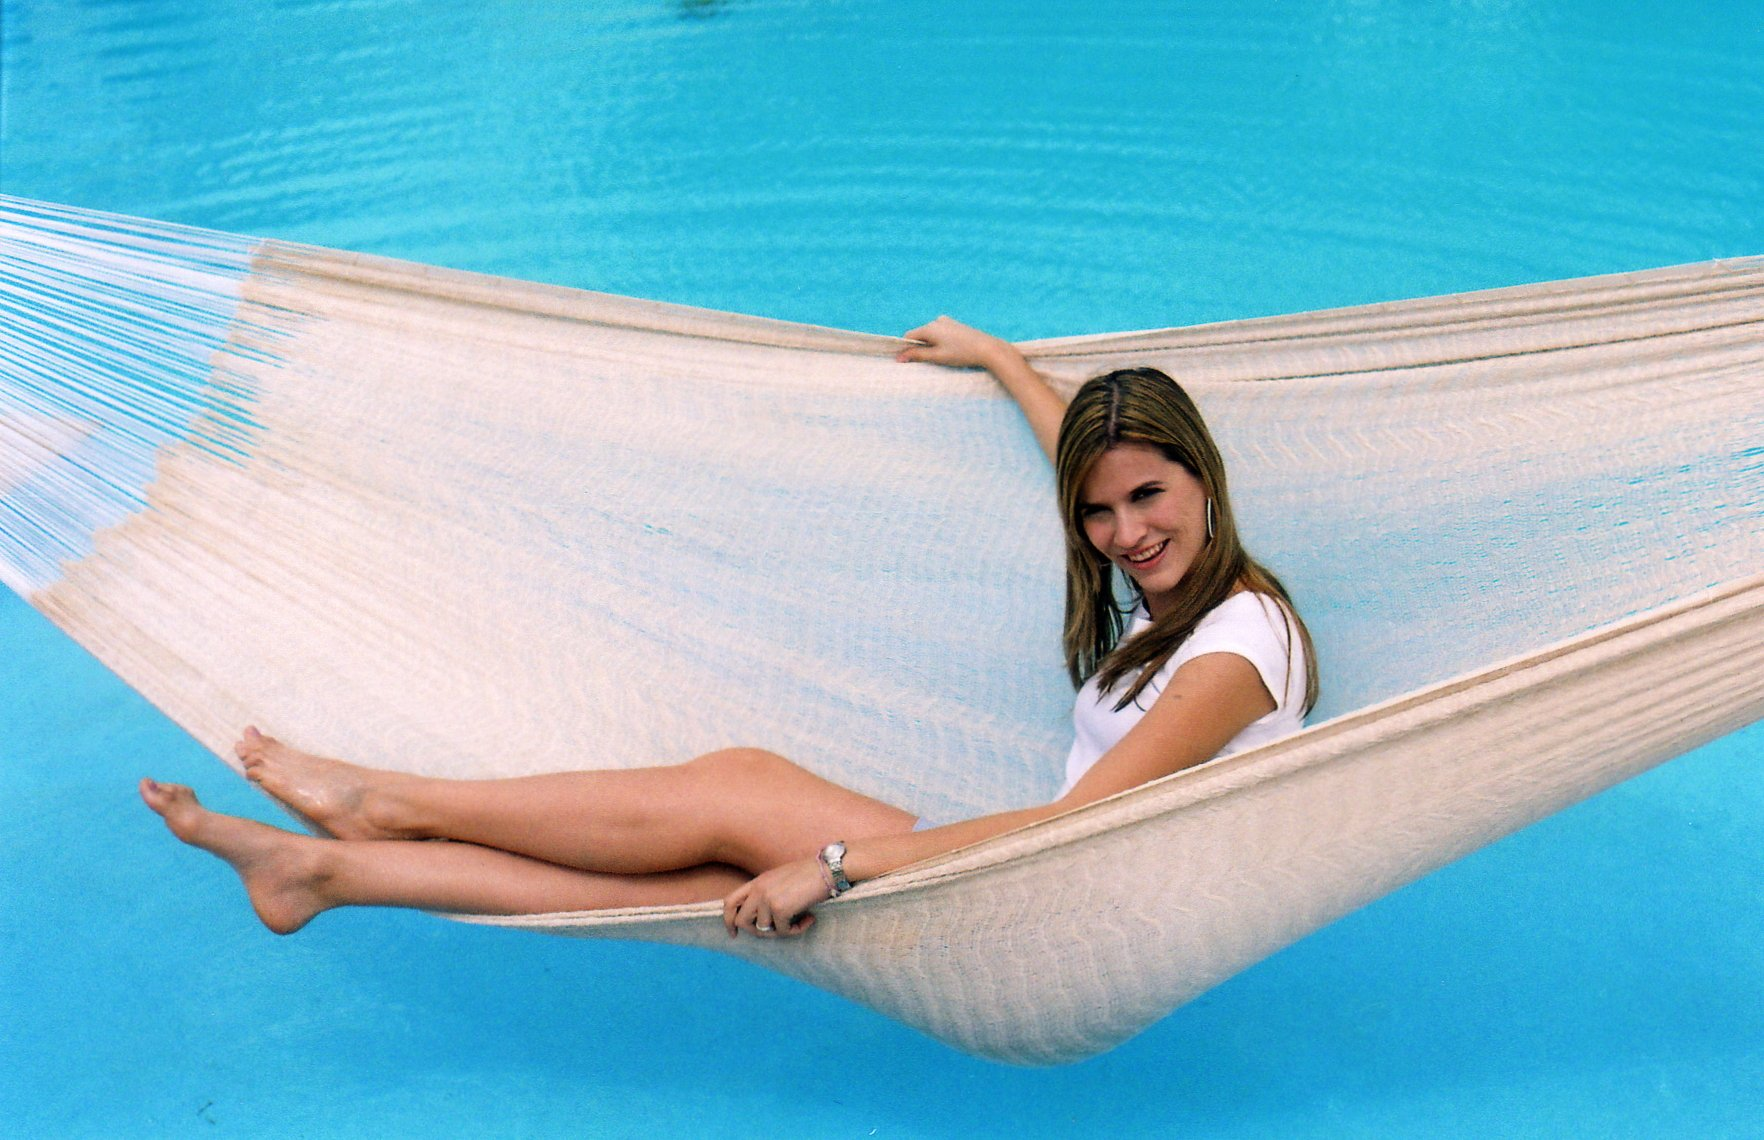 Hammocks Rada- Handmade Yucatan Hammock - Matrimonial Size Natural Color - 13ft long Artisan Crafted by HAMMOCKS RADA